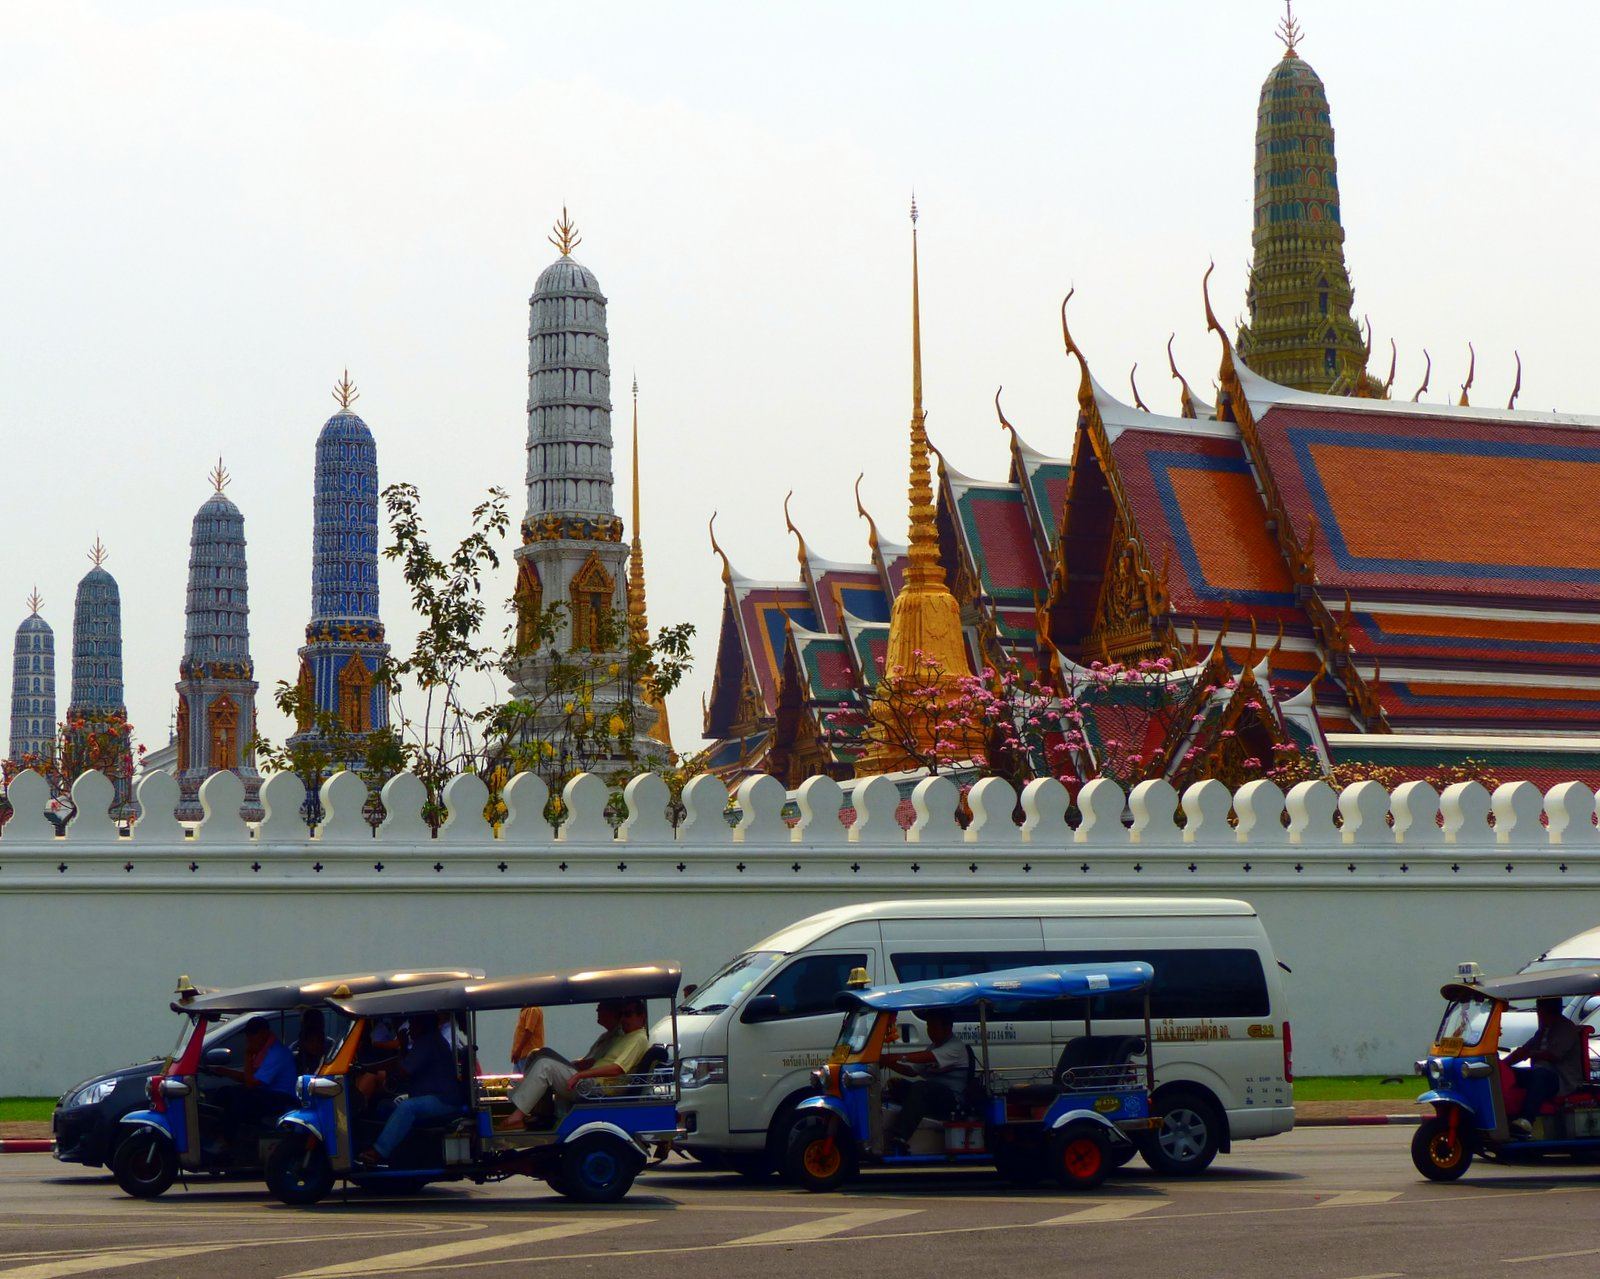 Tuk Tuks outside the Grand Palace